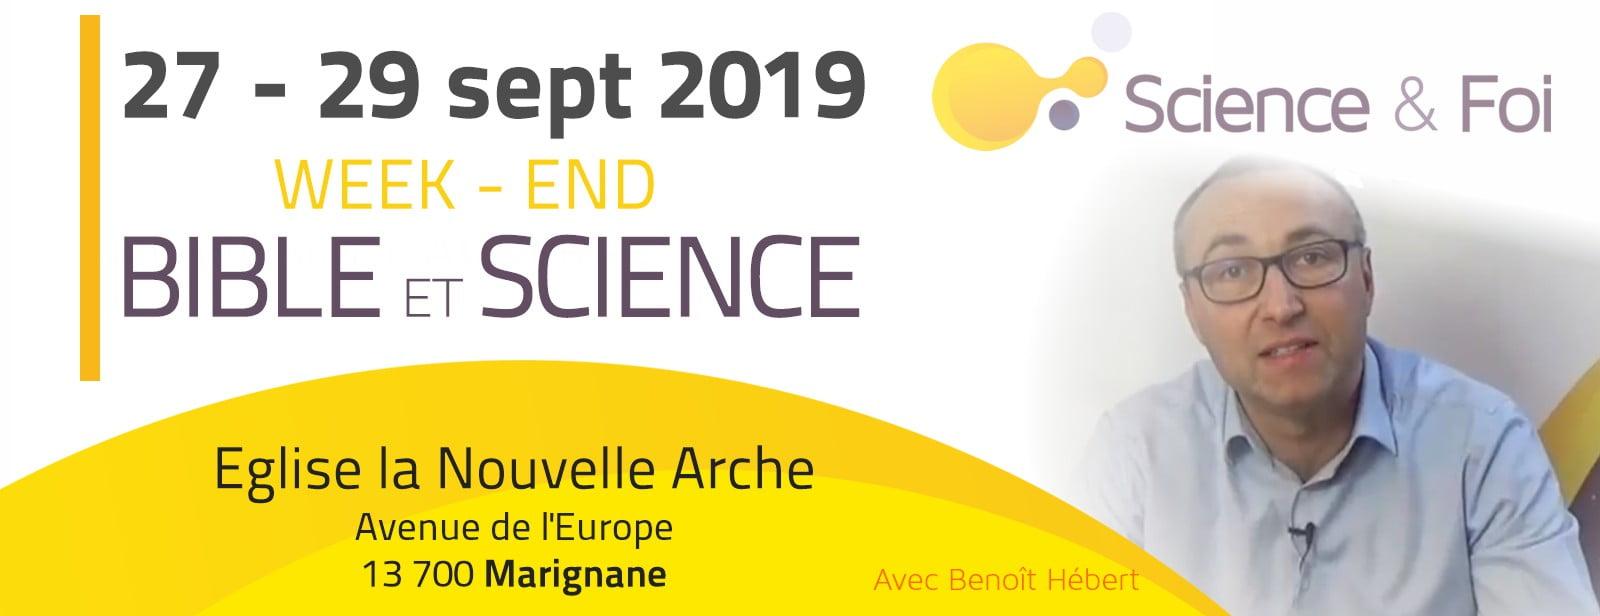 Week-end Bible et Science à Marignane 27-29 sept 2019